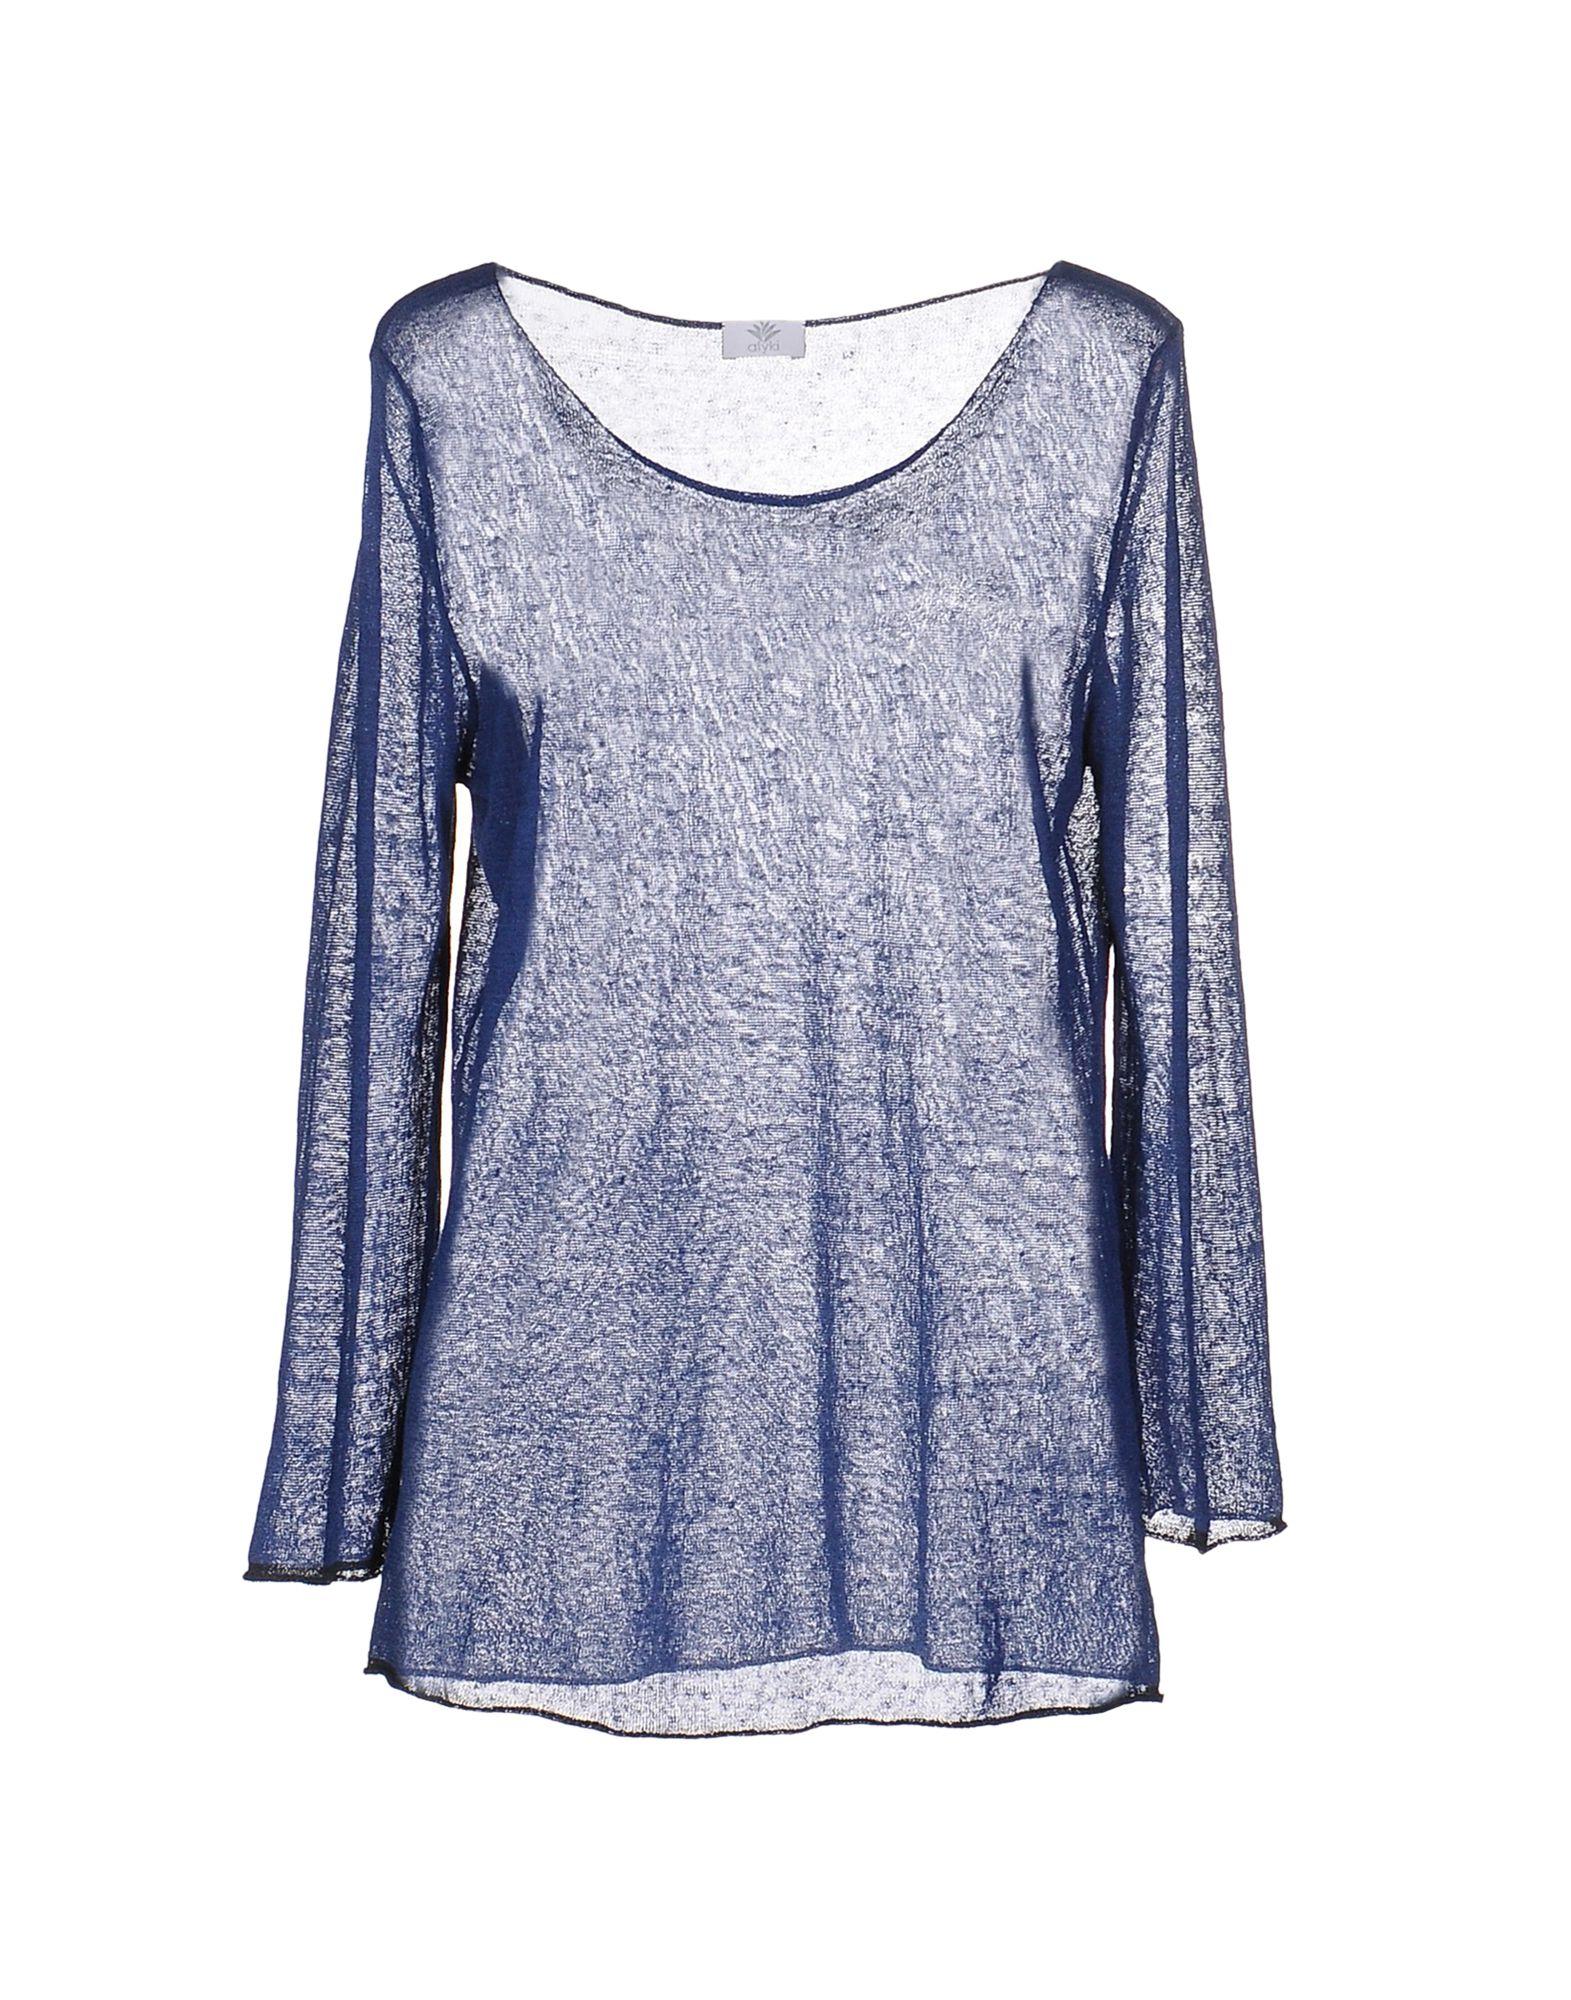 ALYKI Sweater in Blue